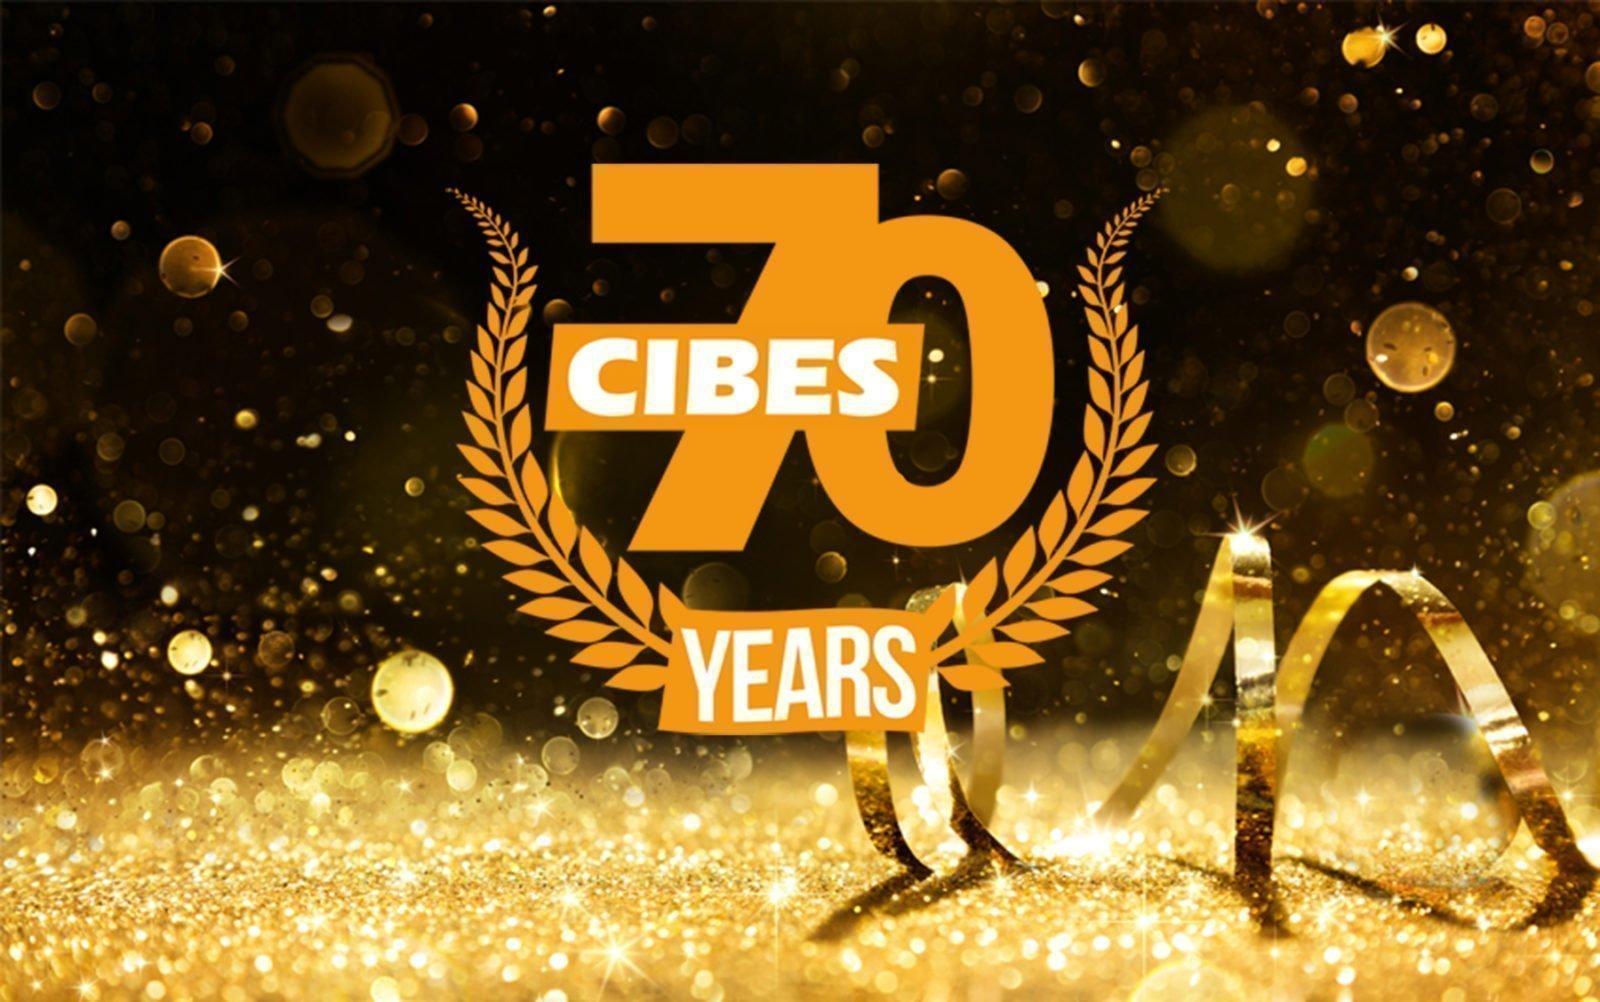 Cibes 70 years